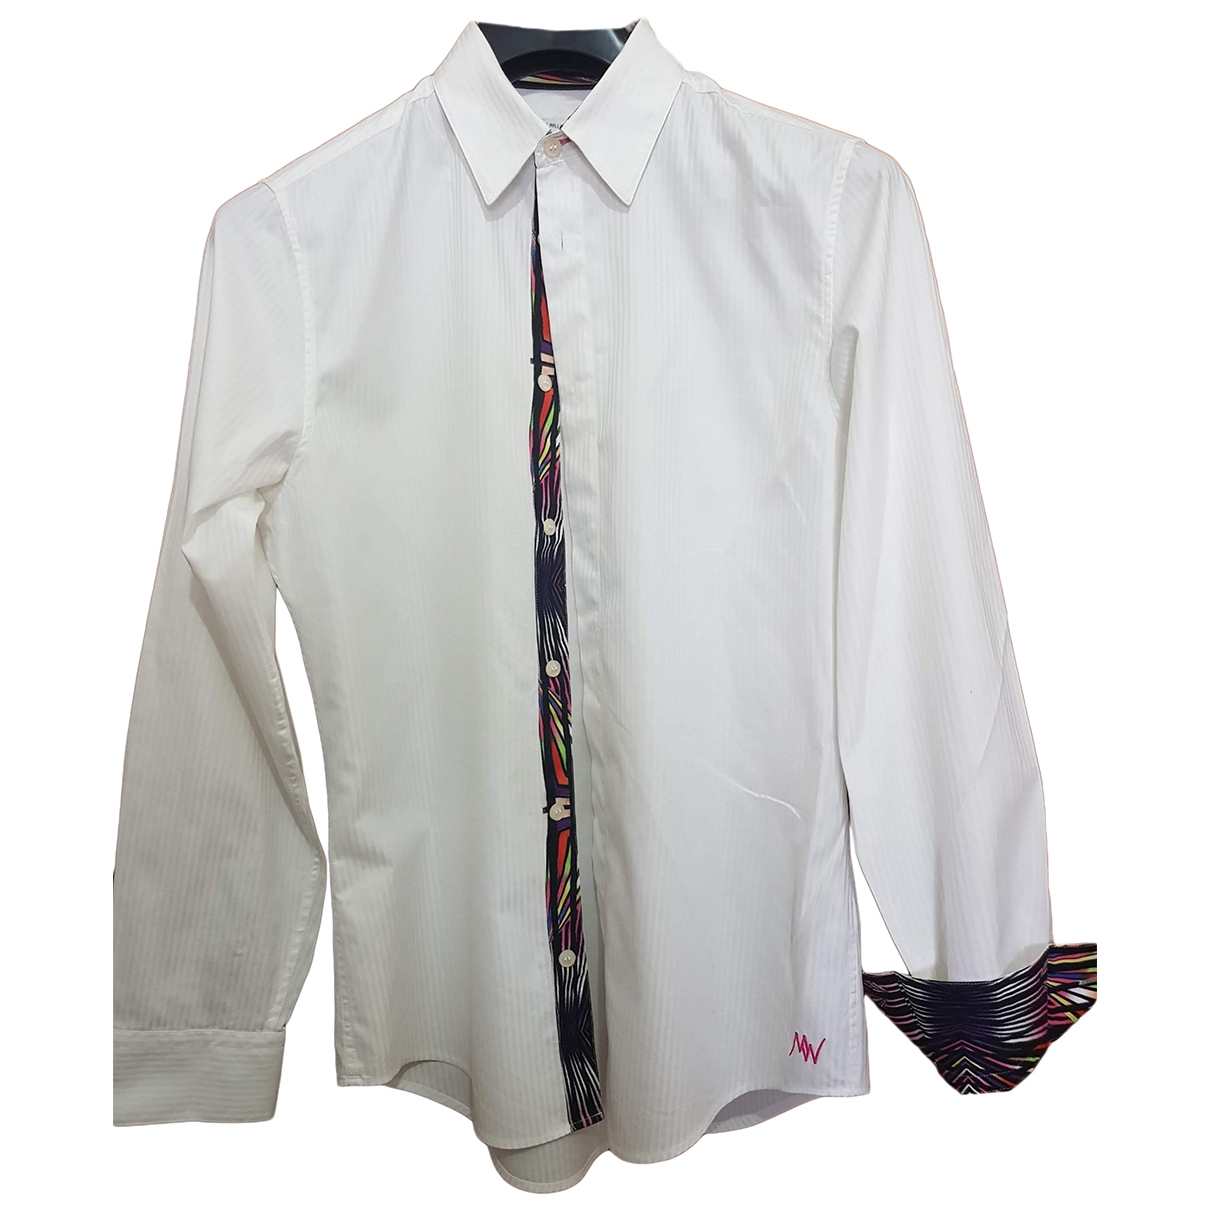 Matthew Williamson For H&m \N White Cotton Shirts for Men S International